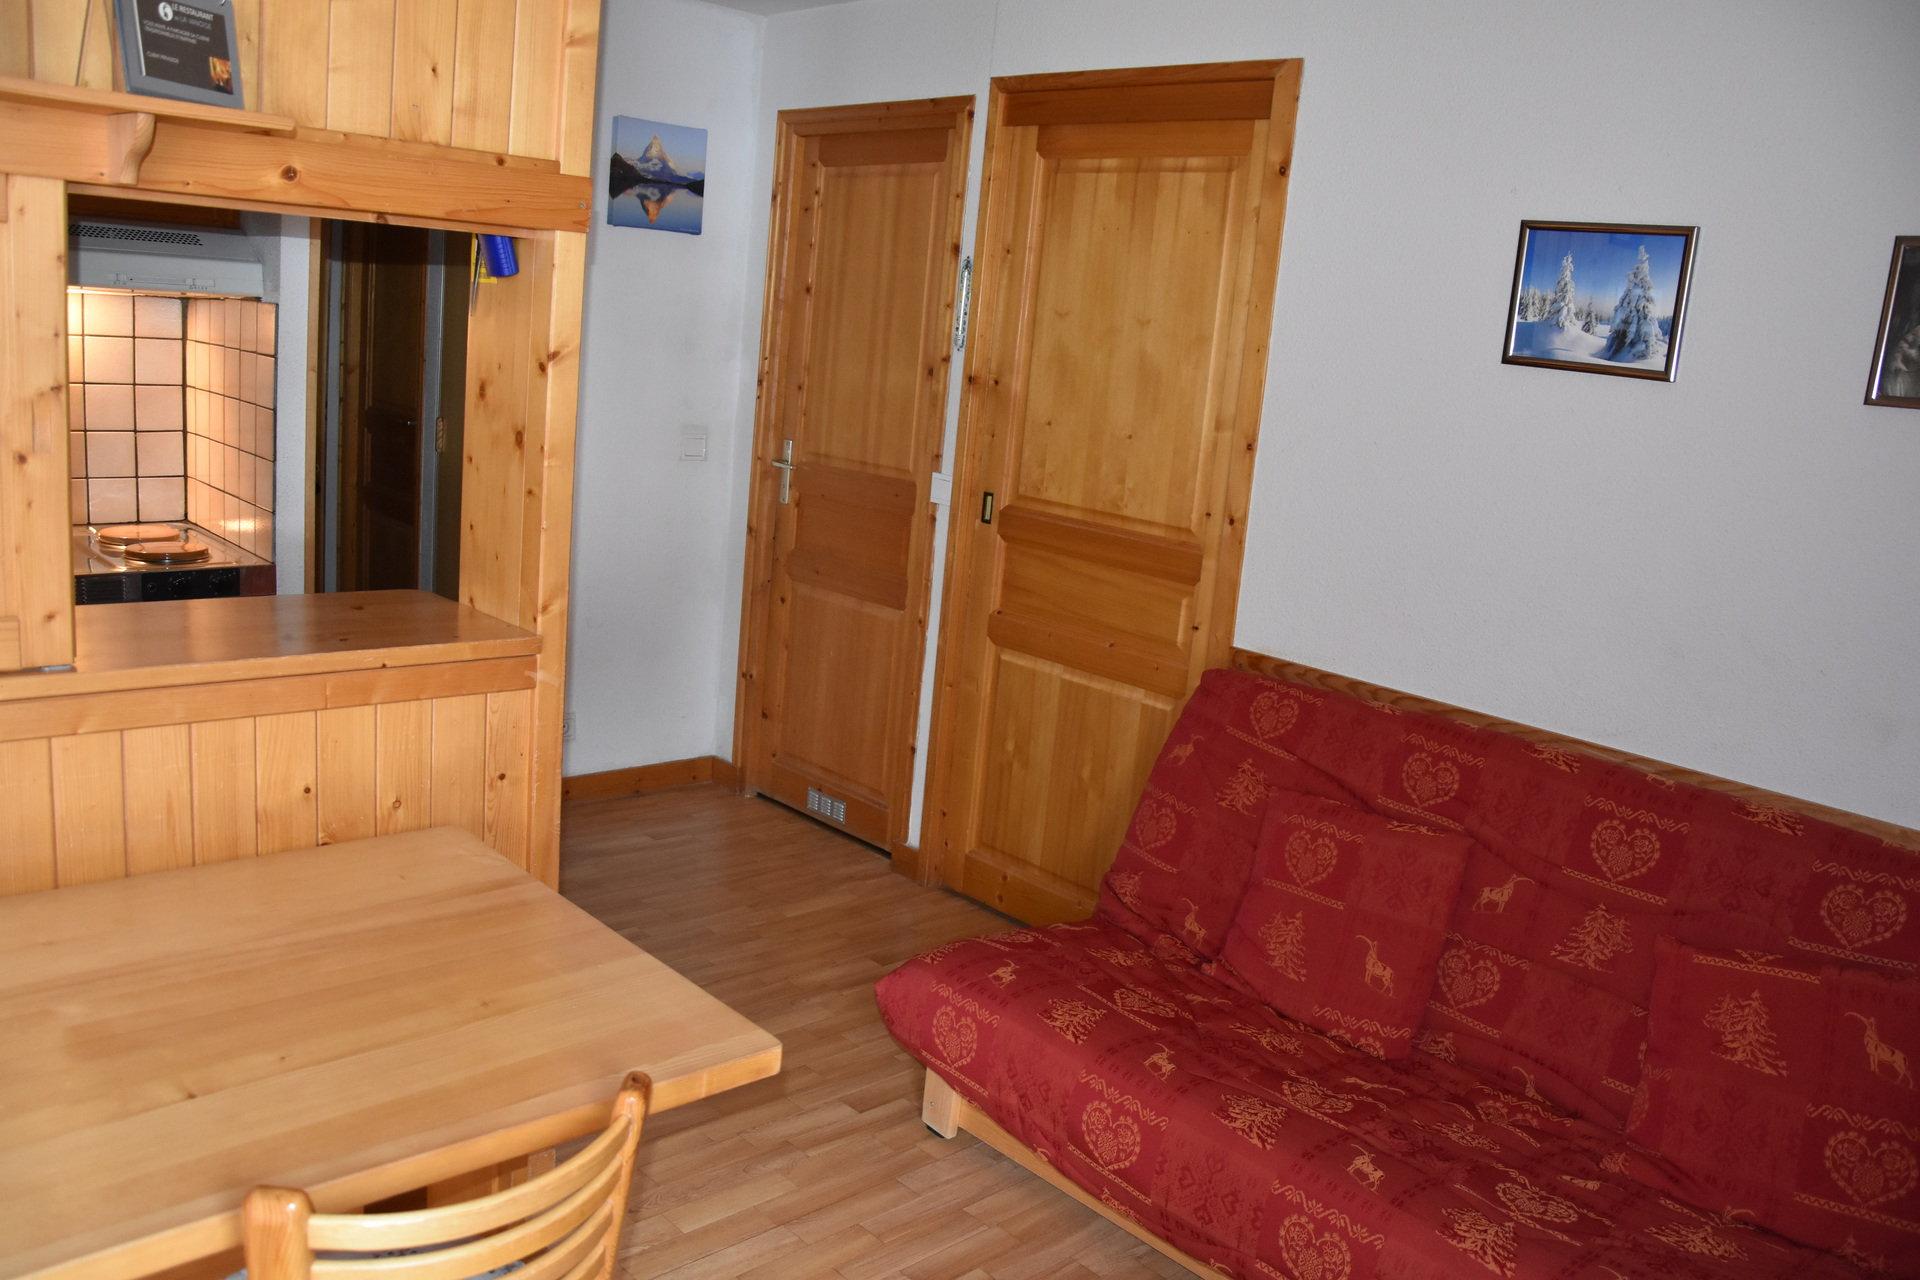 Rental reference : VANOI46 to Pralognan la Vanoise